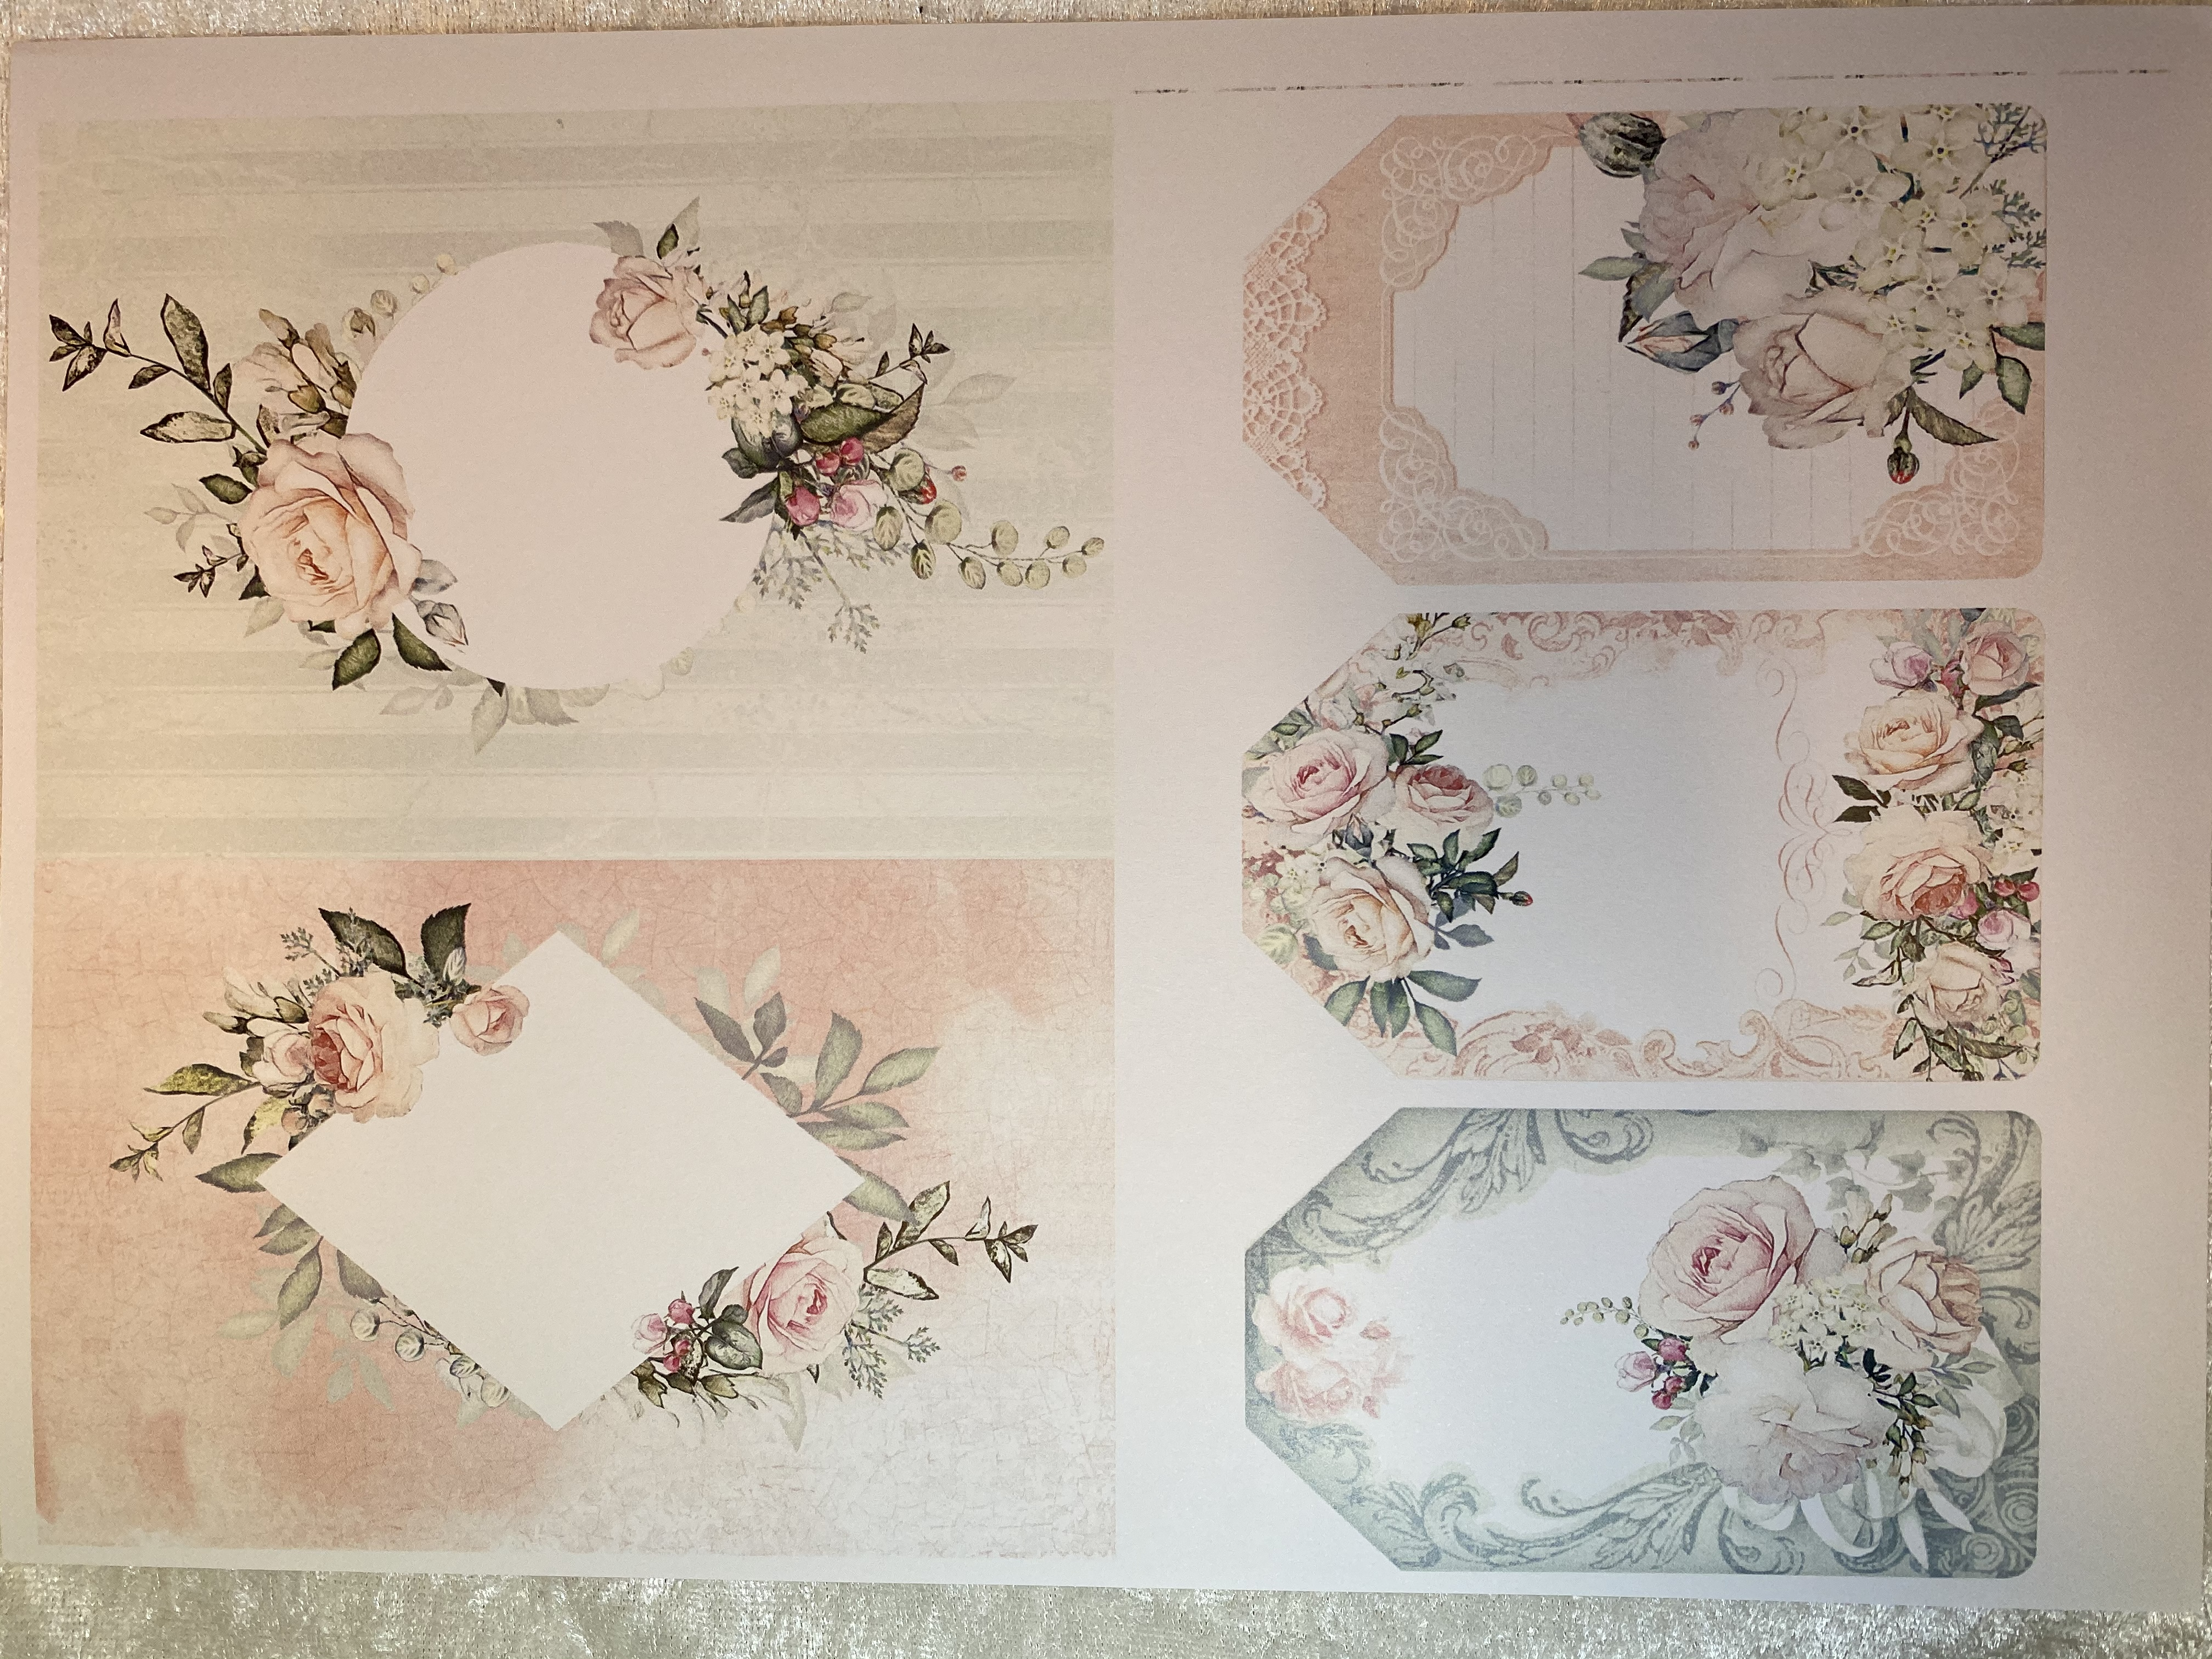 Felicita Design blokk - Wedding -  6 stk A4 mønsterark